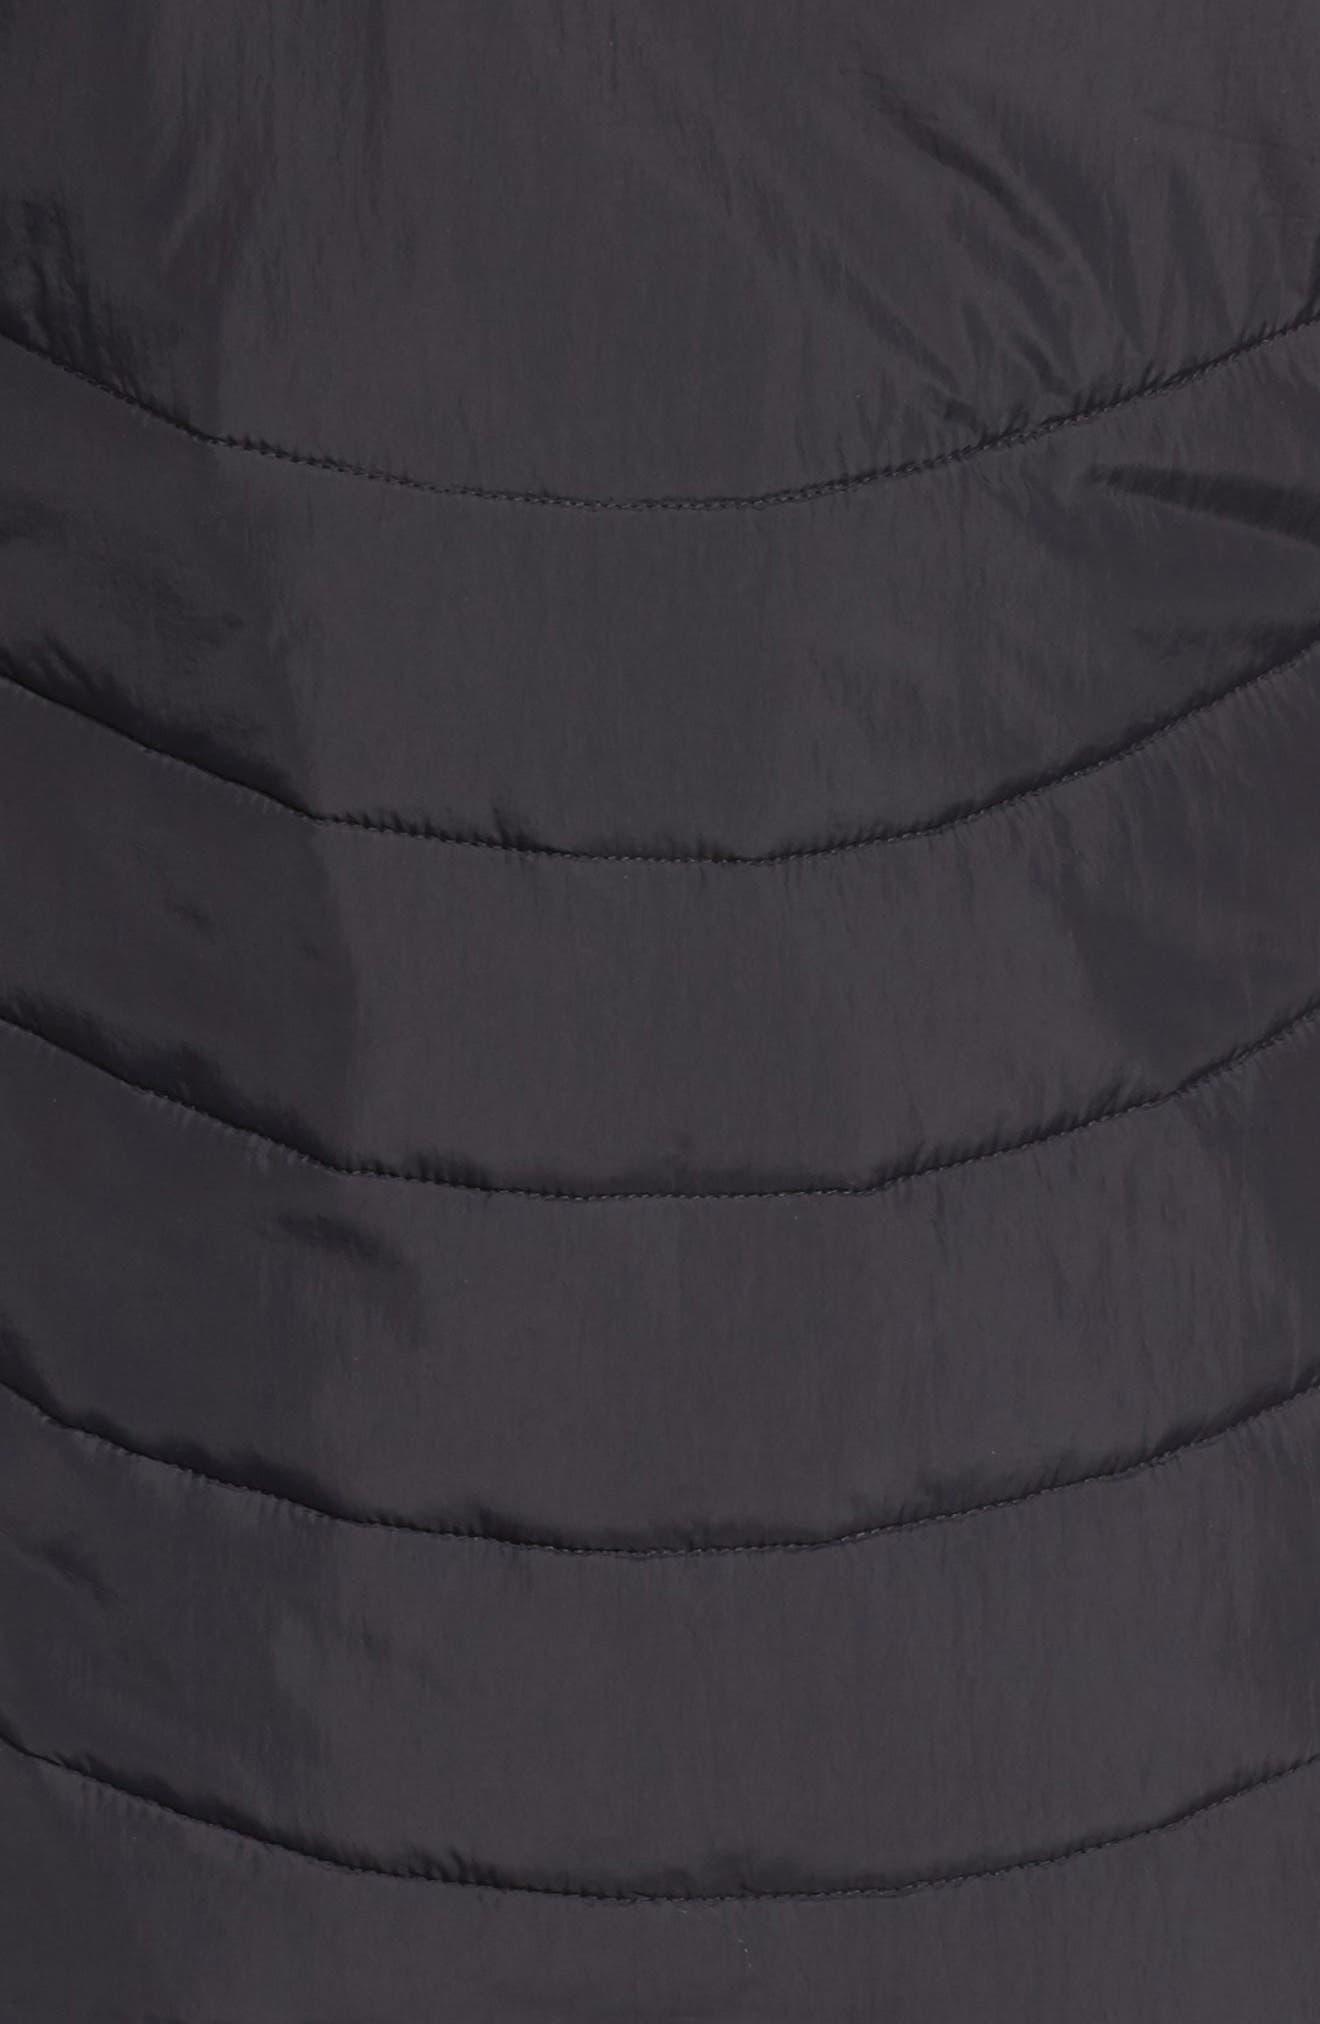 Alternate Image 5  - The North Face Harway Heatseeker™ Water-Resistant Jacket with Faux Fur Trim